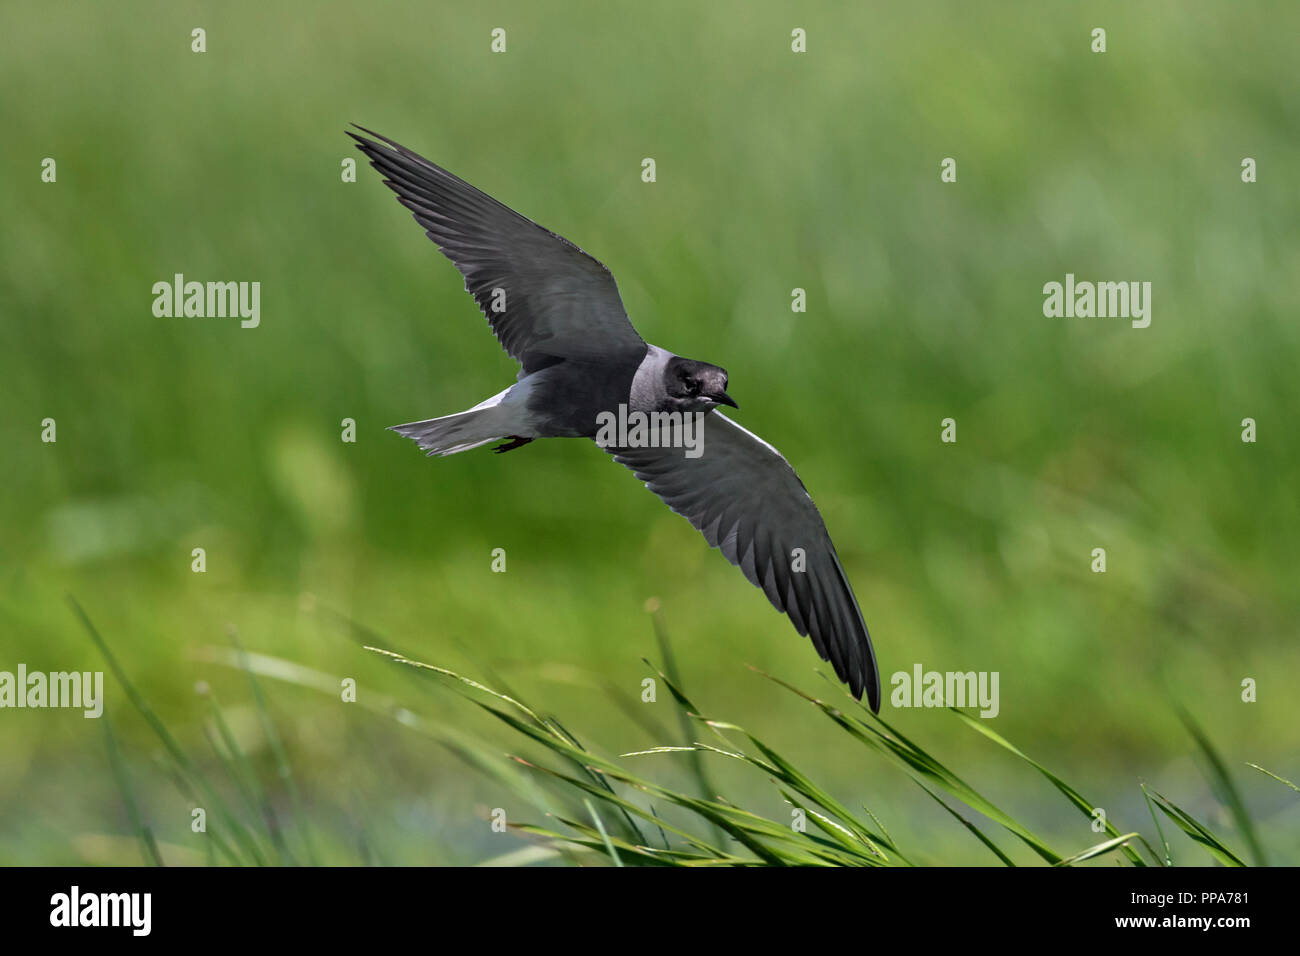 Black tern (Chlidonias niger) flying in breeding plumage over wetland in spring - Stock Image